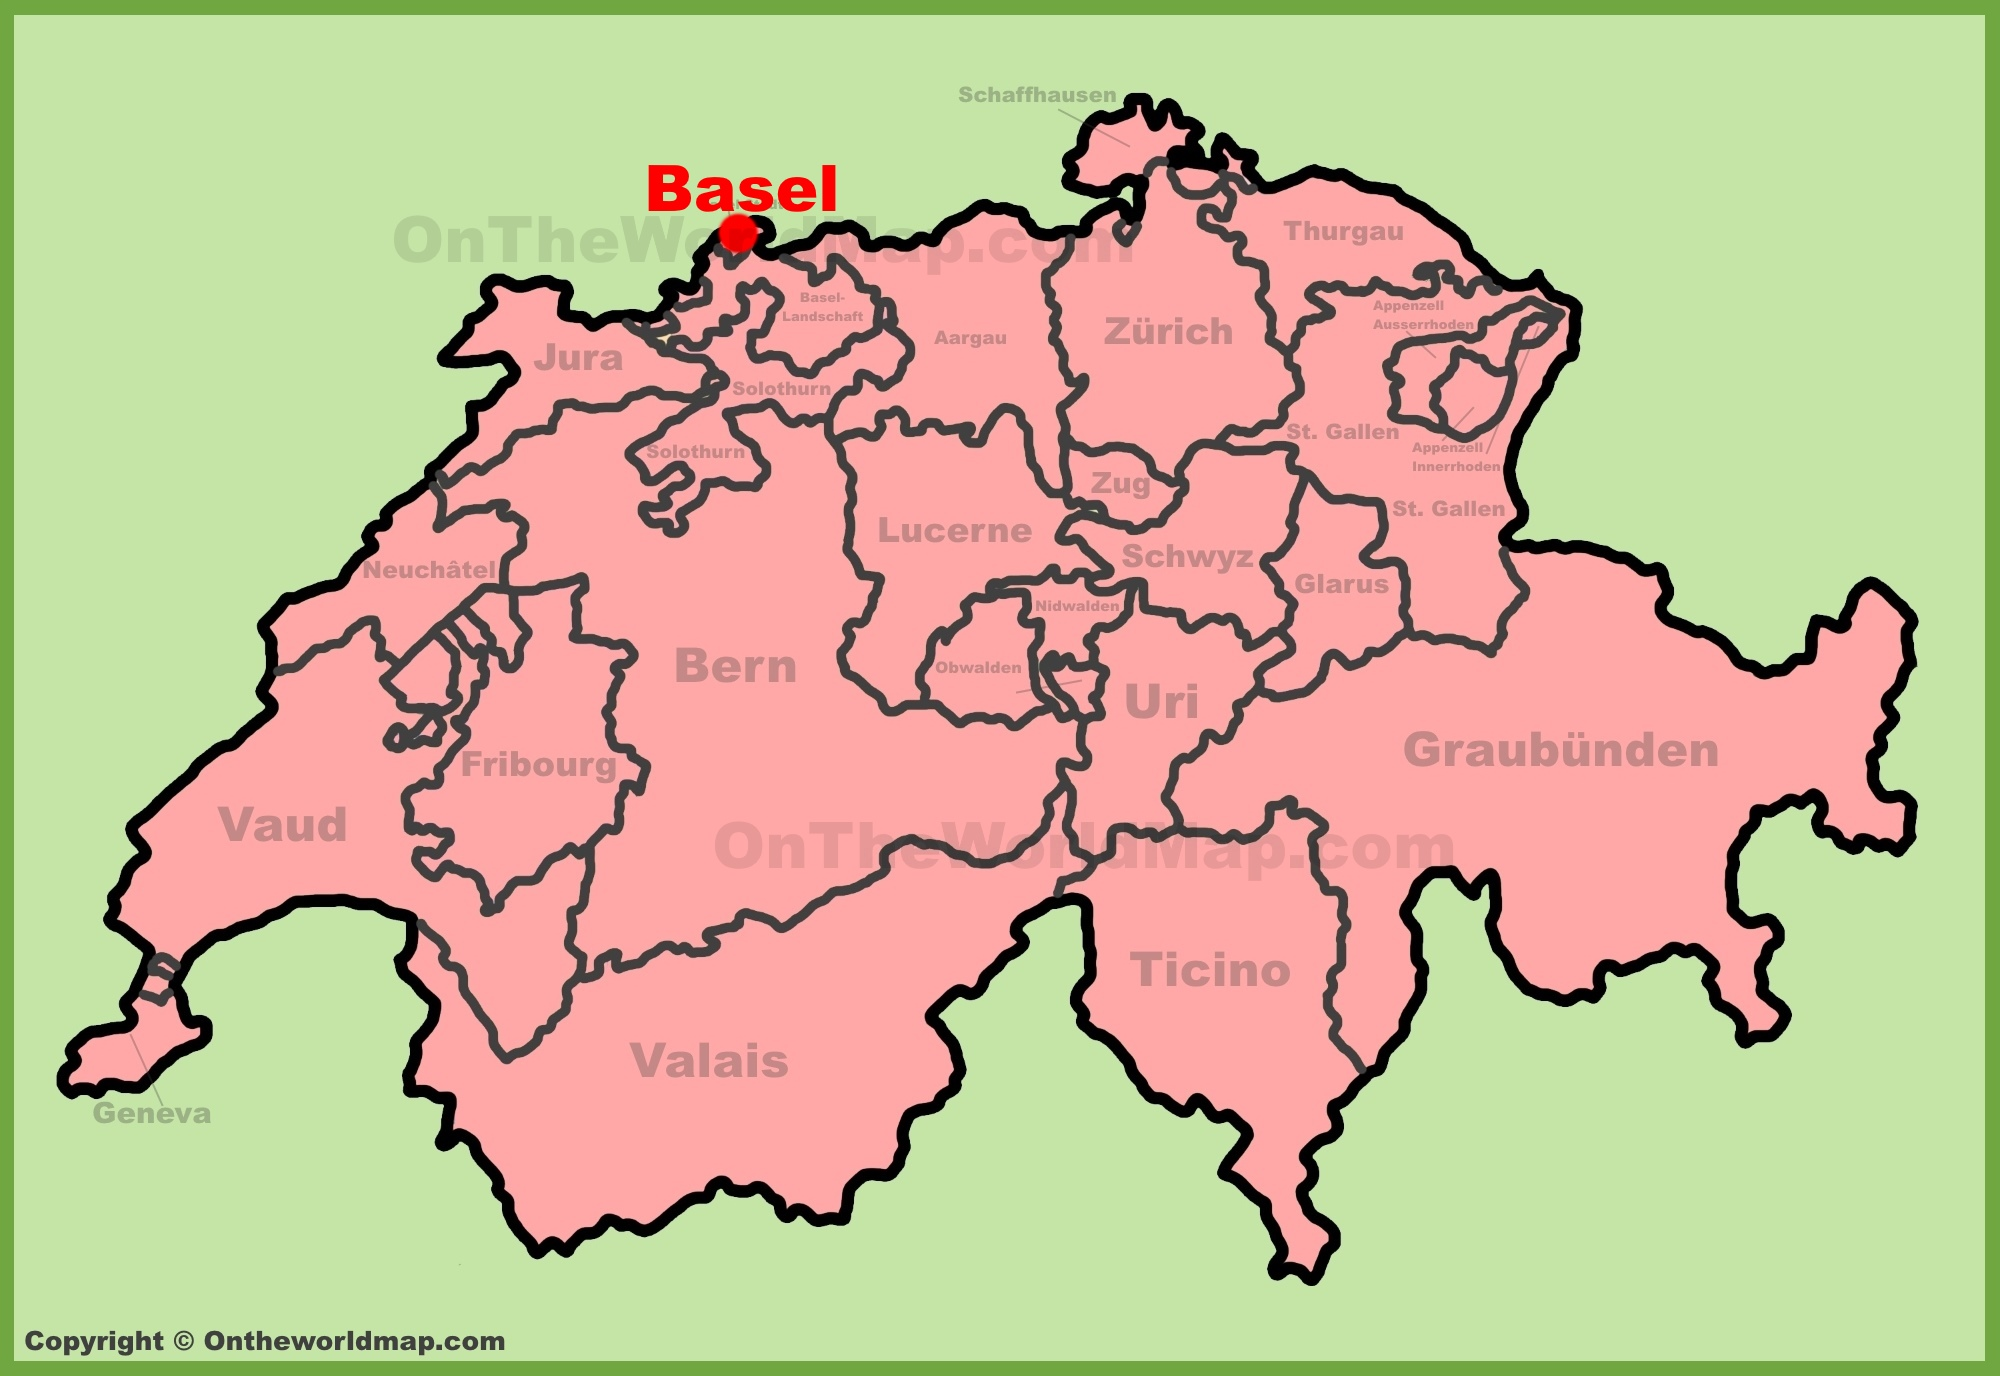 Basel Switzerland Map Basel location on the Switzerland map